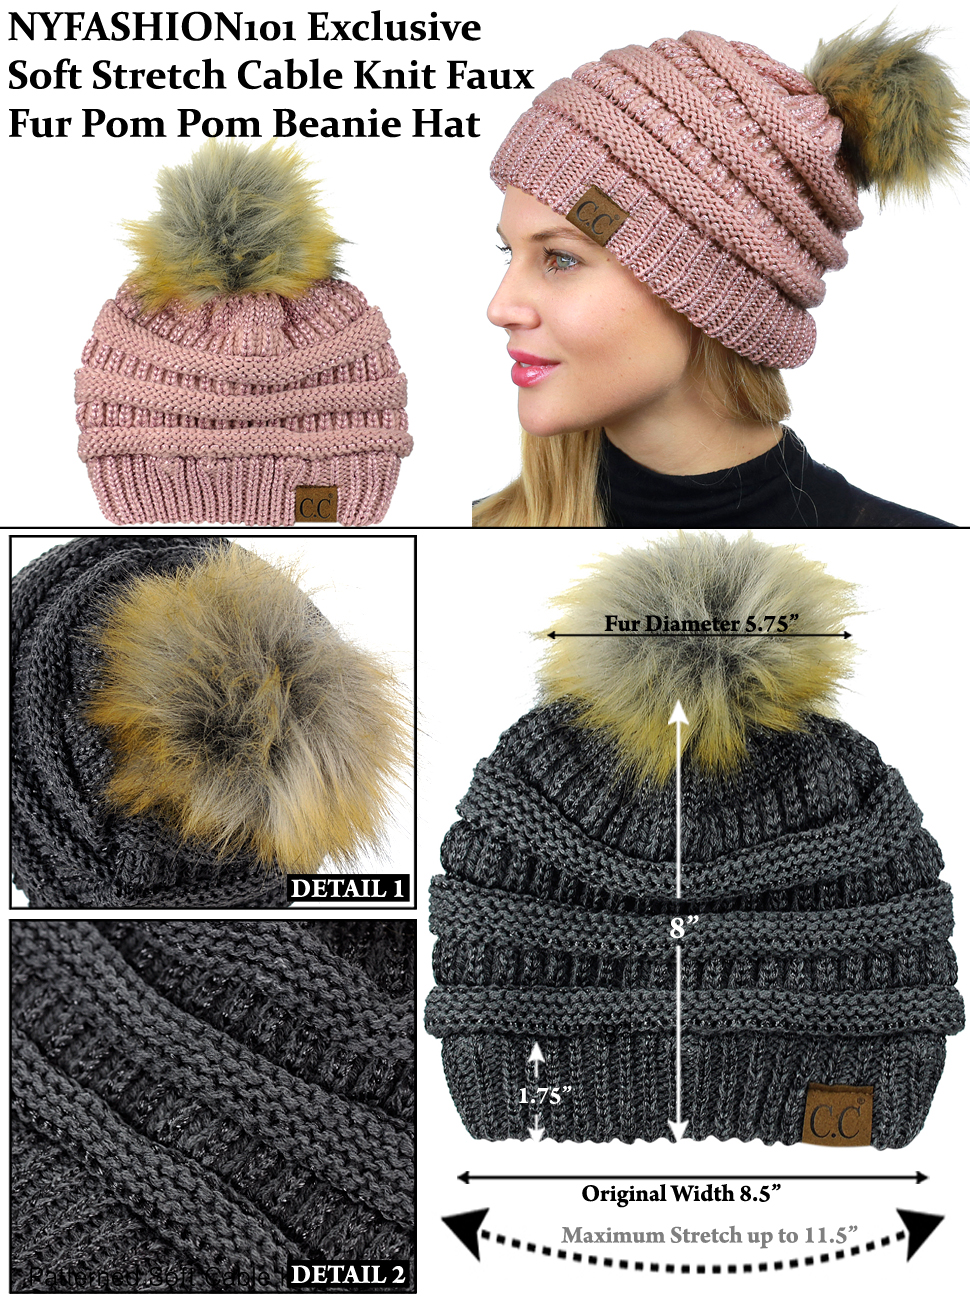 6e99b6143359c NYFASHION101 Exclusive Soft Stretch Cable Knit Faux Fur Pom Pom ...